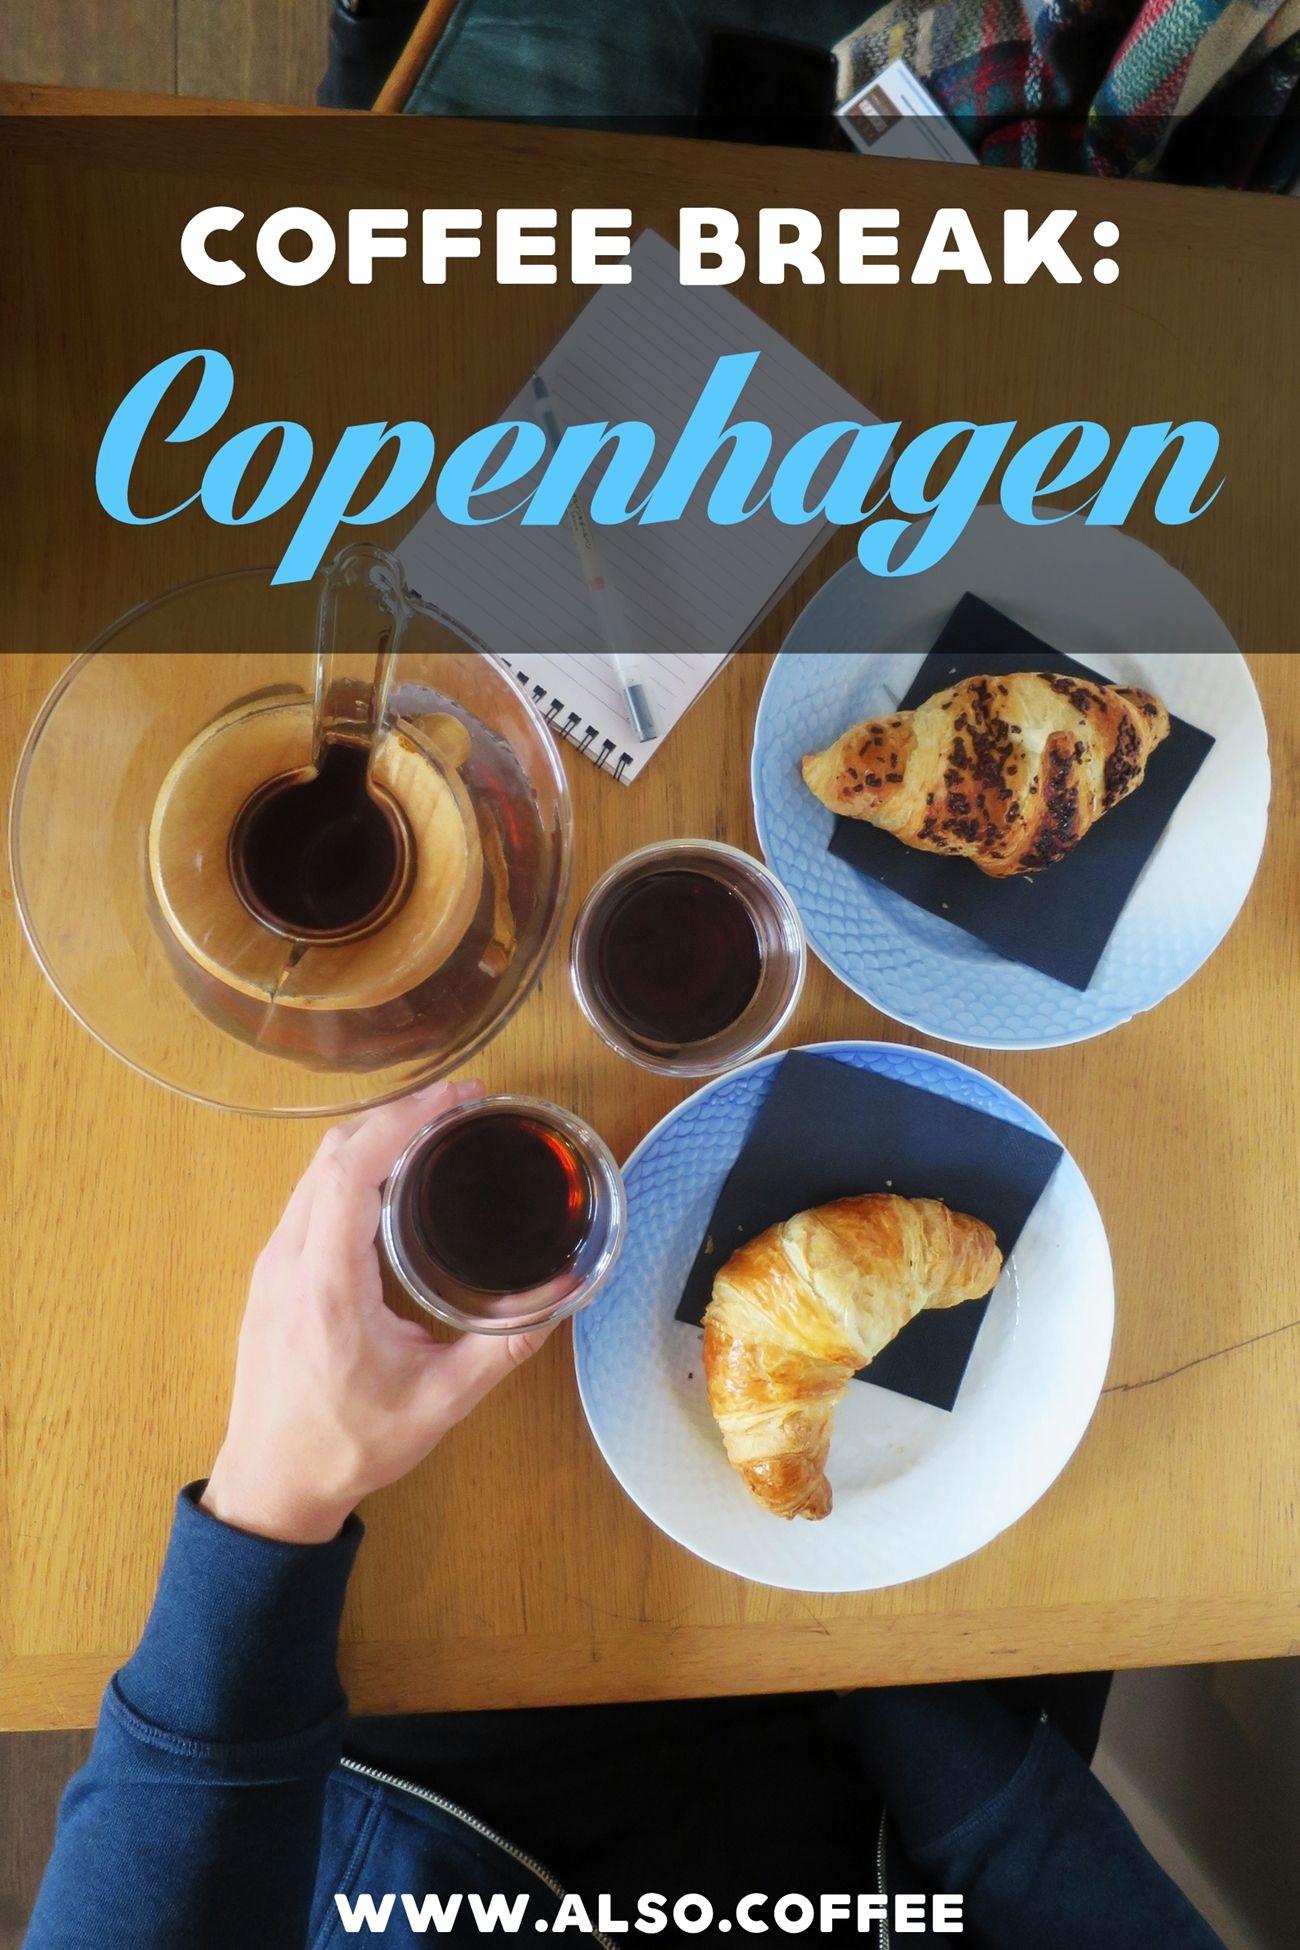 Coffee Break Kent Kaffe Laboratorium In Copenhagen Denmark Also Coffee Coffee Break Copenhagen Coffee Blog